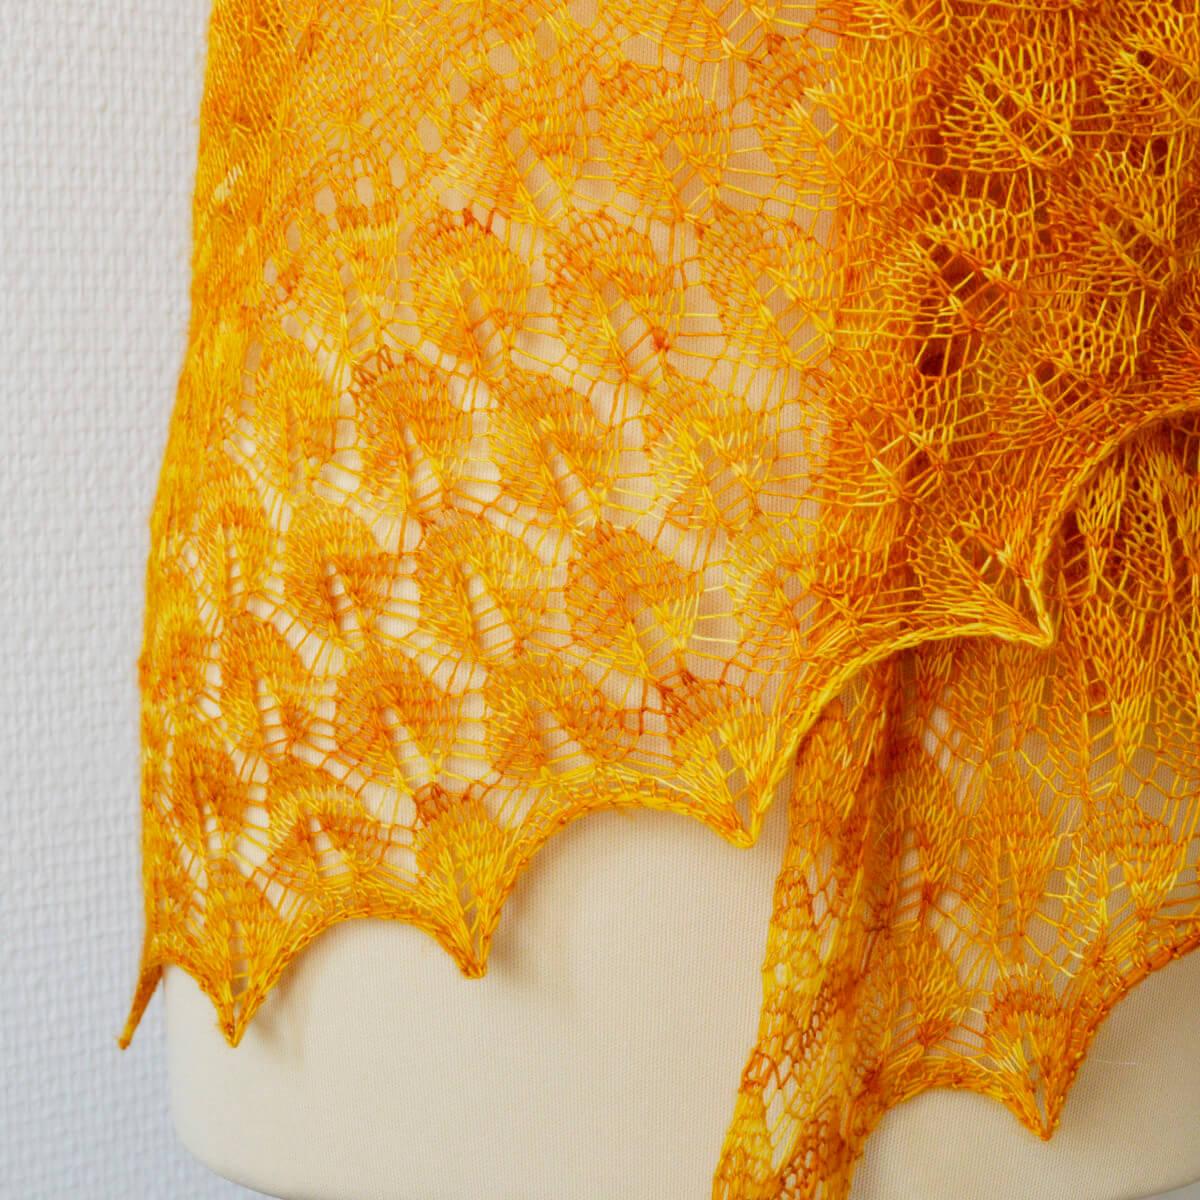 Zomerzon lace detail